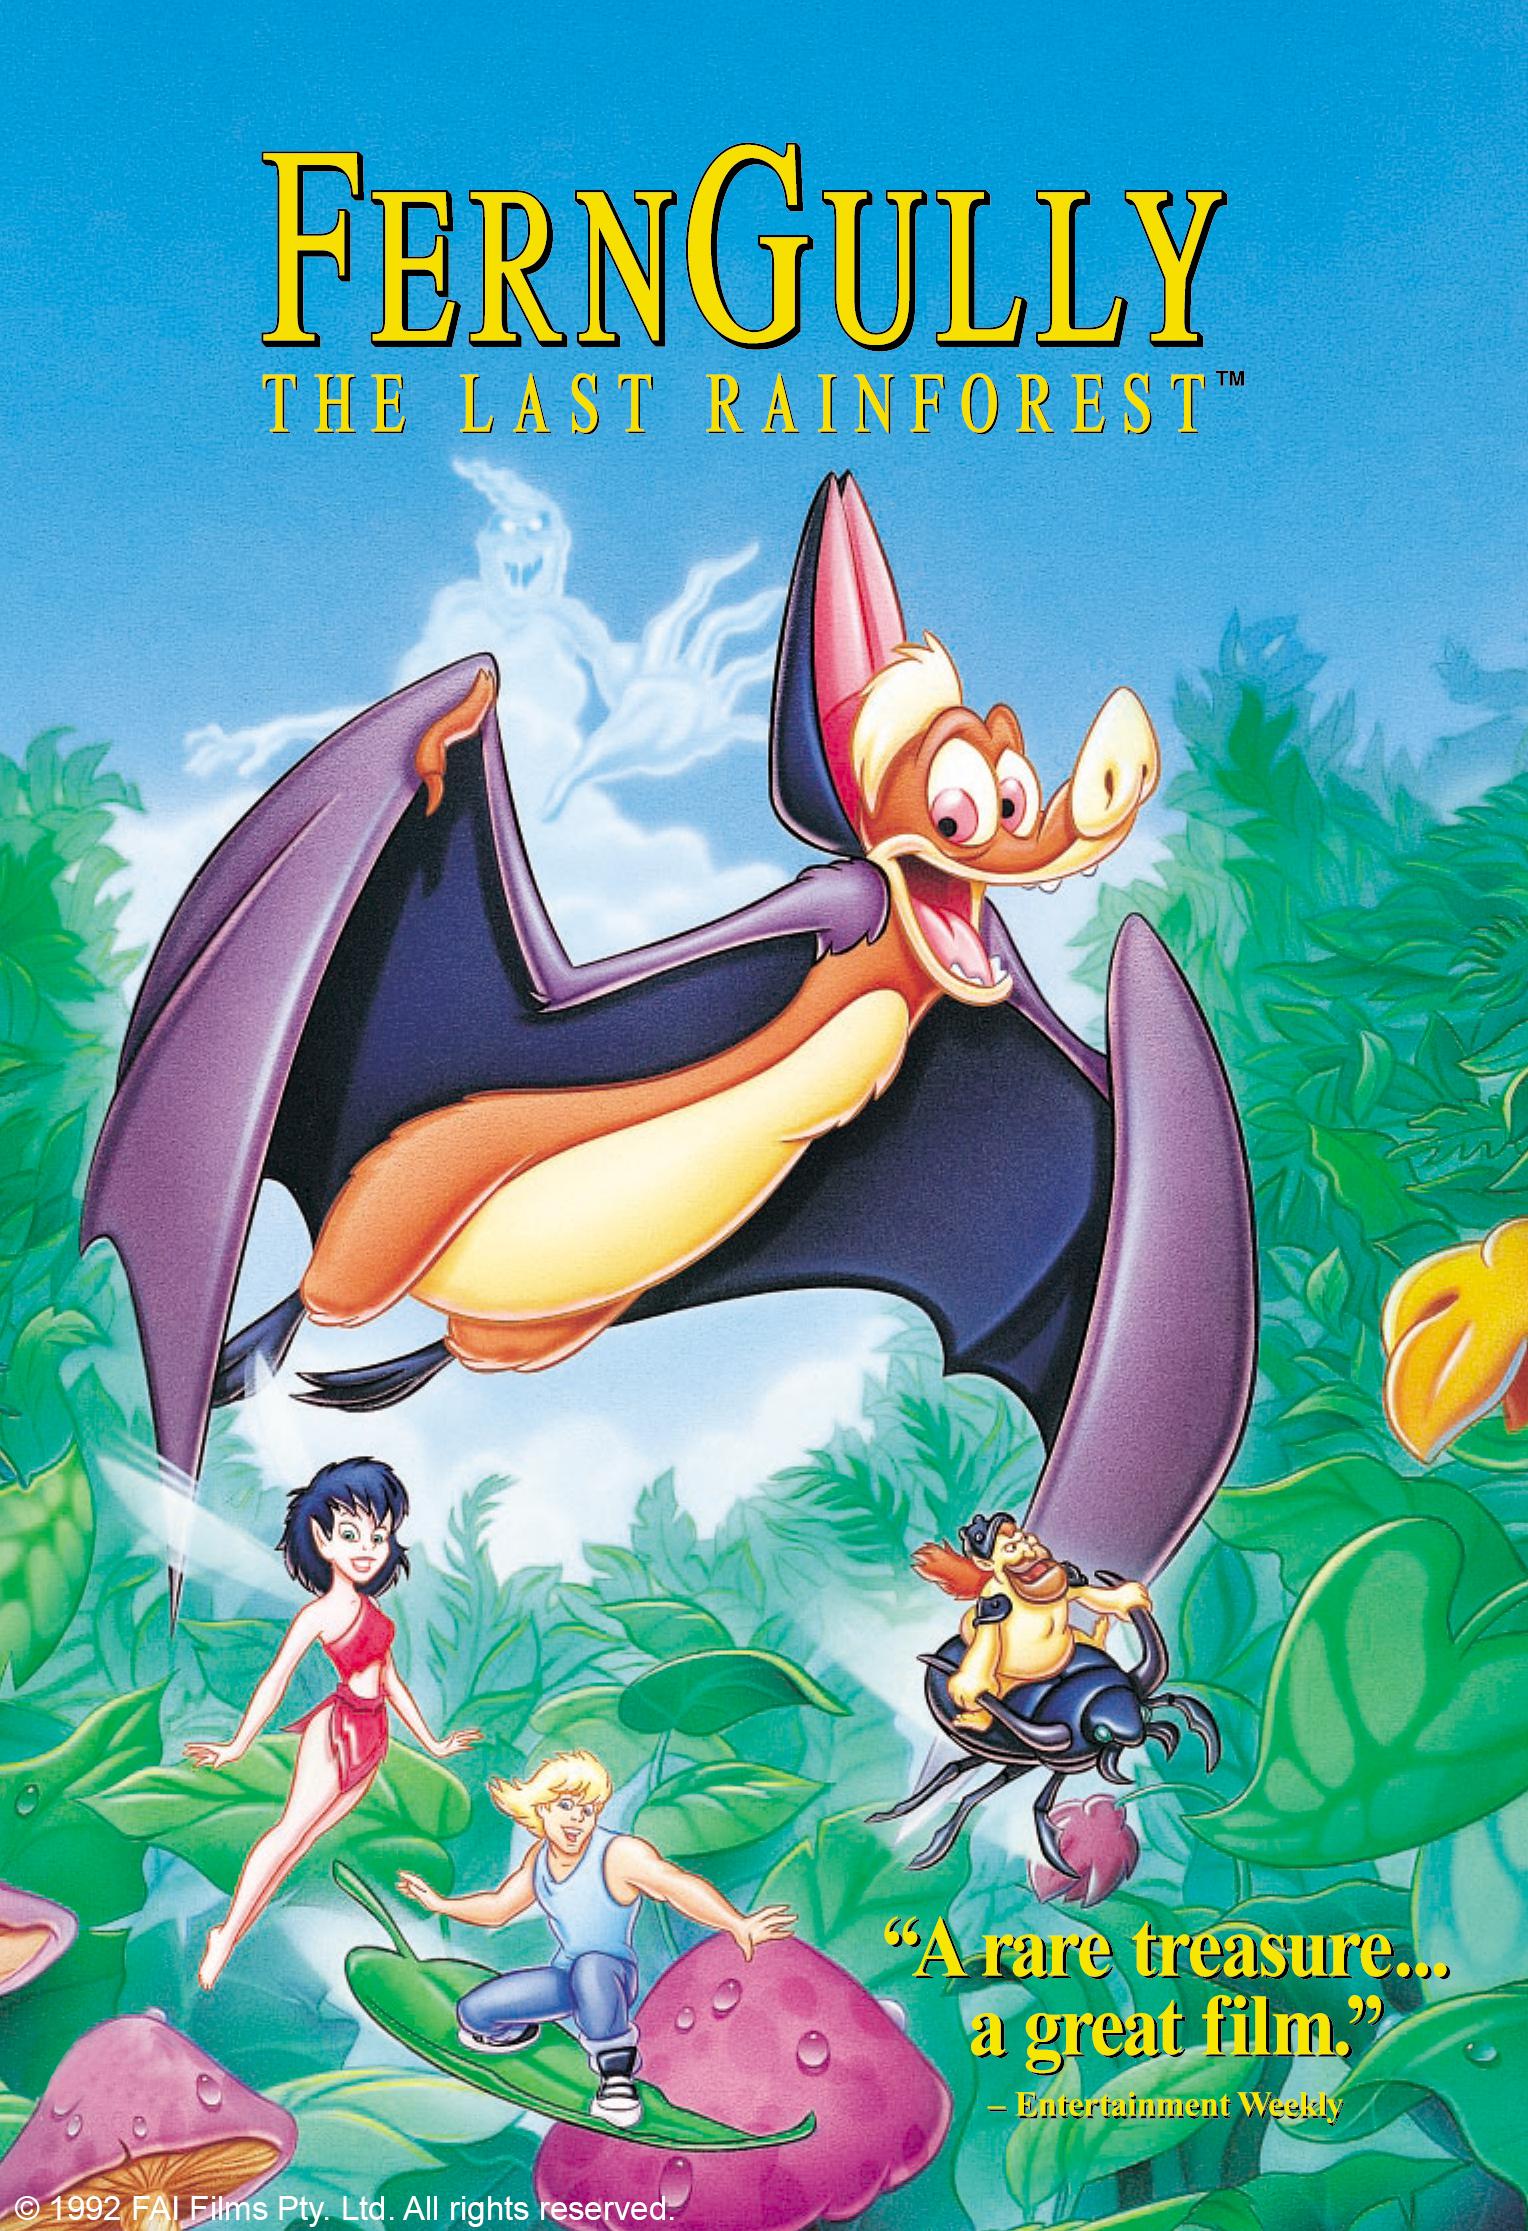 FernGully: The Last Rainforest (1992) Poster #2